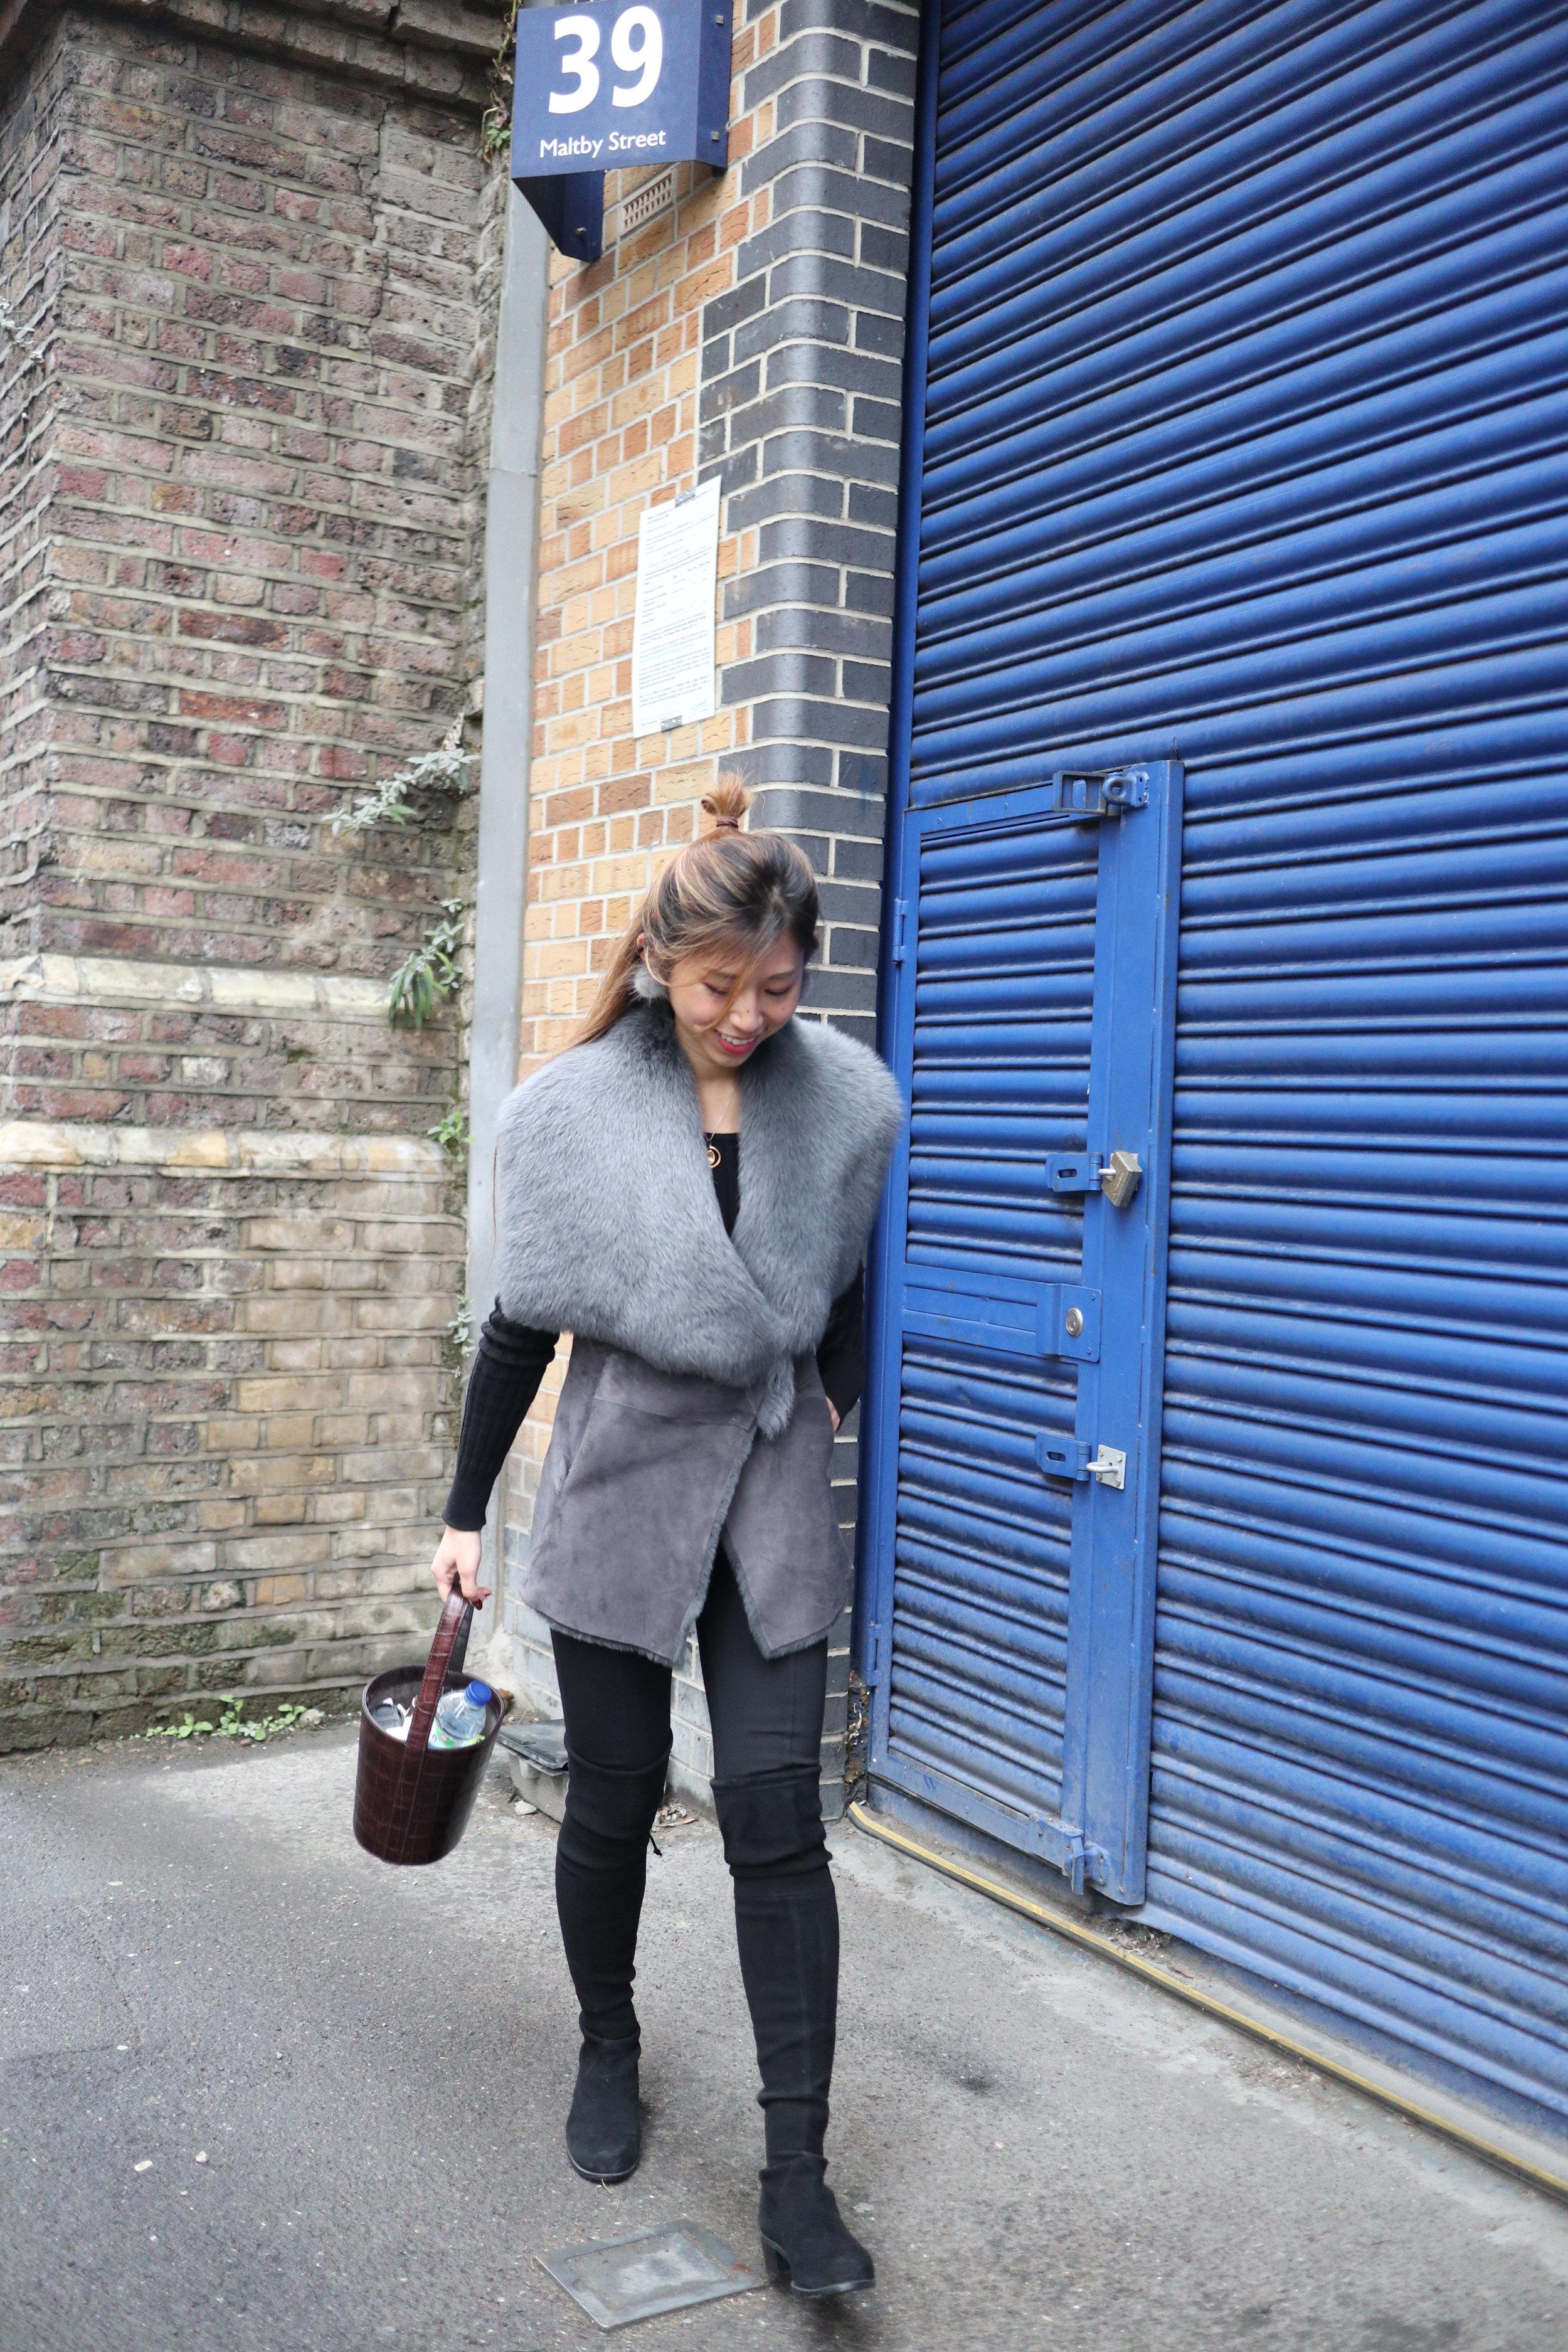 Karen Millen Luxury Lamb Leather Gilet (Grey)  / Giordano Ladies black knit / Espirit black leggings /  Stuart Weitzman the Lowland Boot (black suede)  /  STAUD bissett bag brown faux croc  / Fur earrings from Taobao